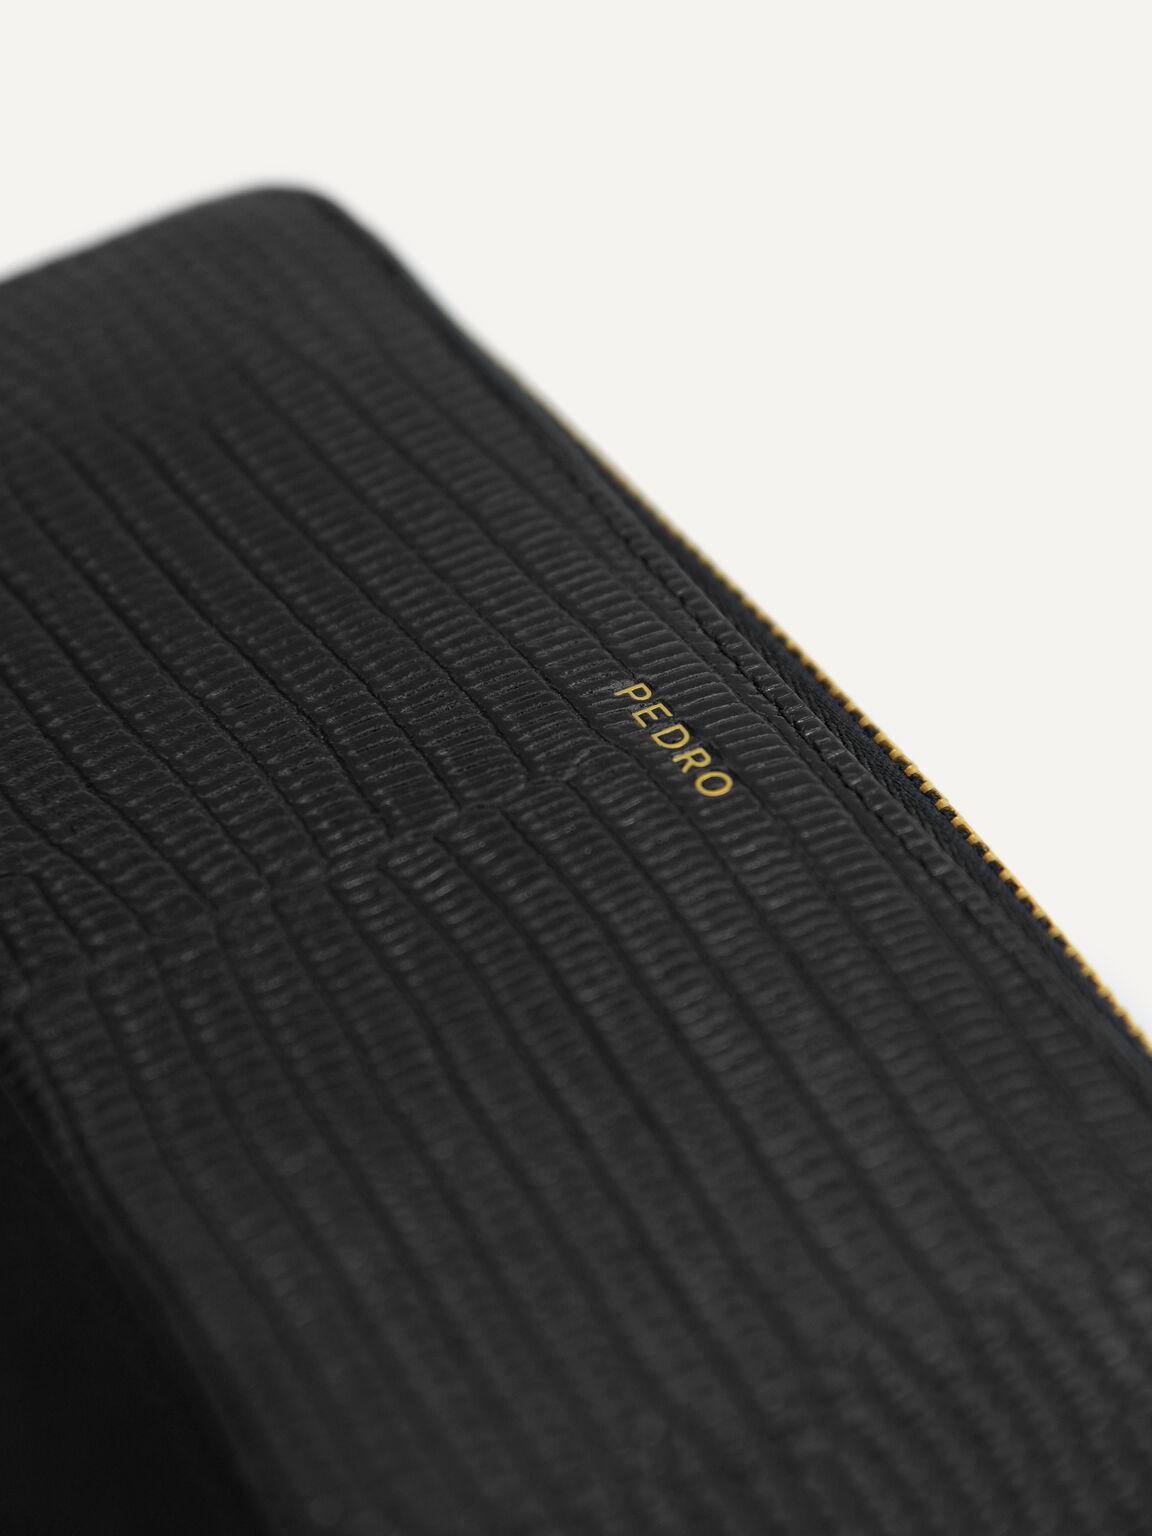 Lizard-Effect Leather Wallet, Black, hi-res